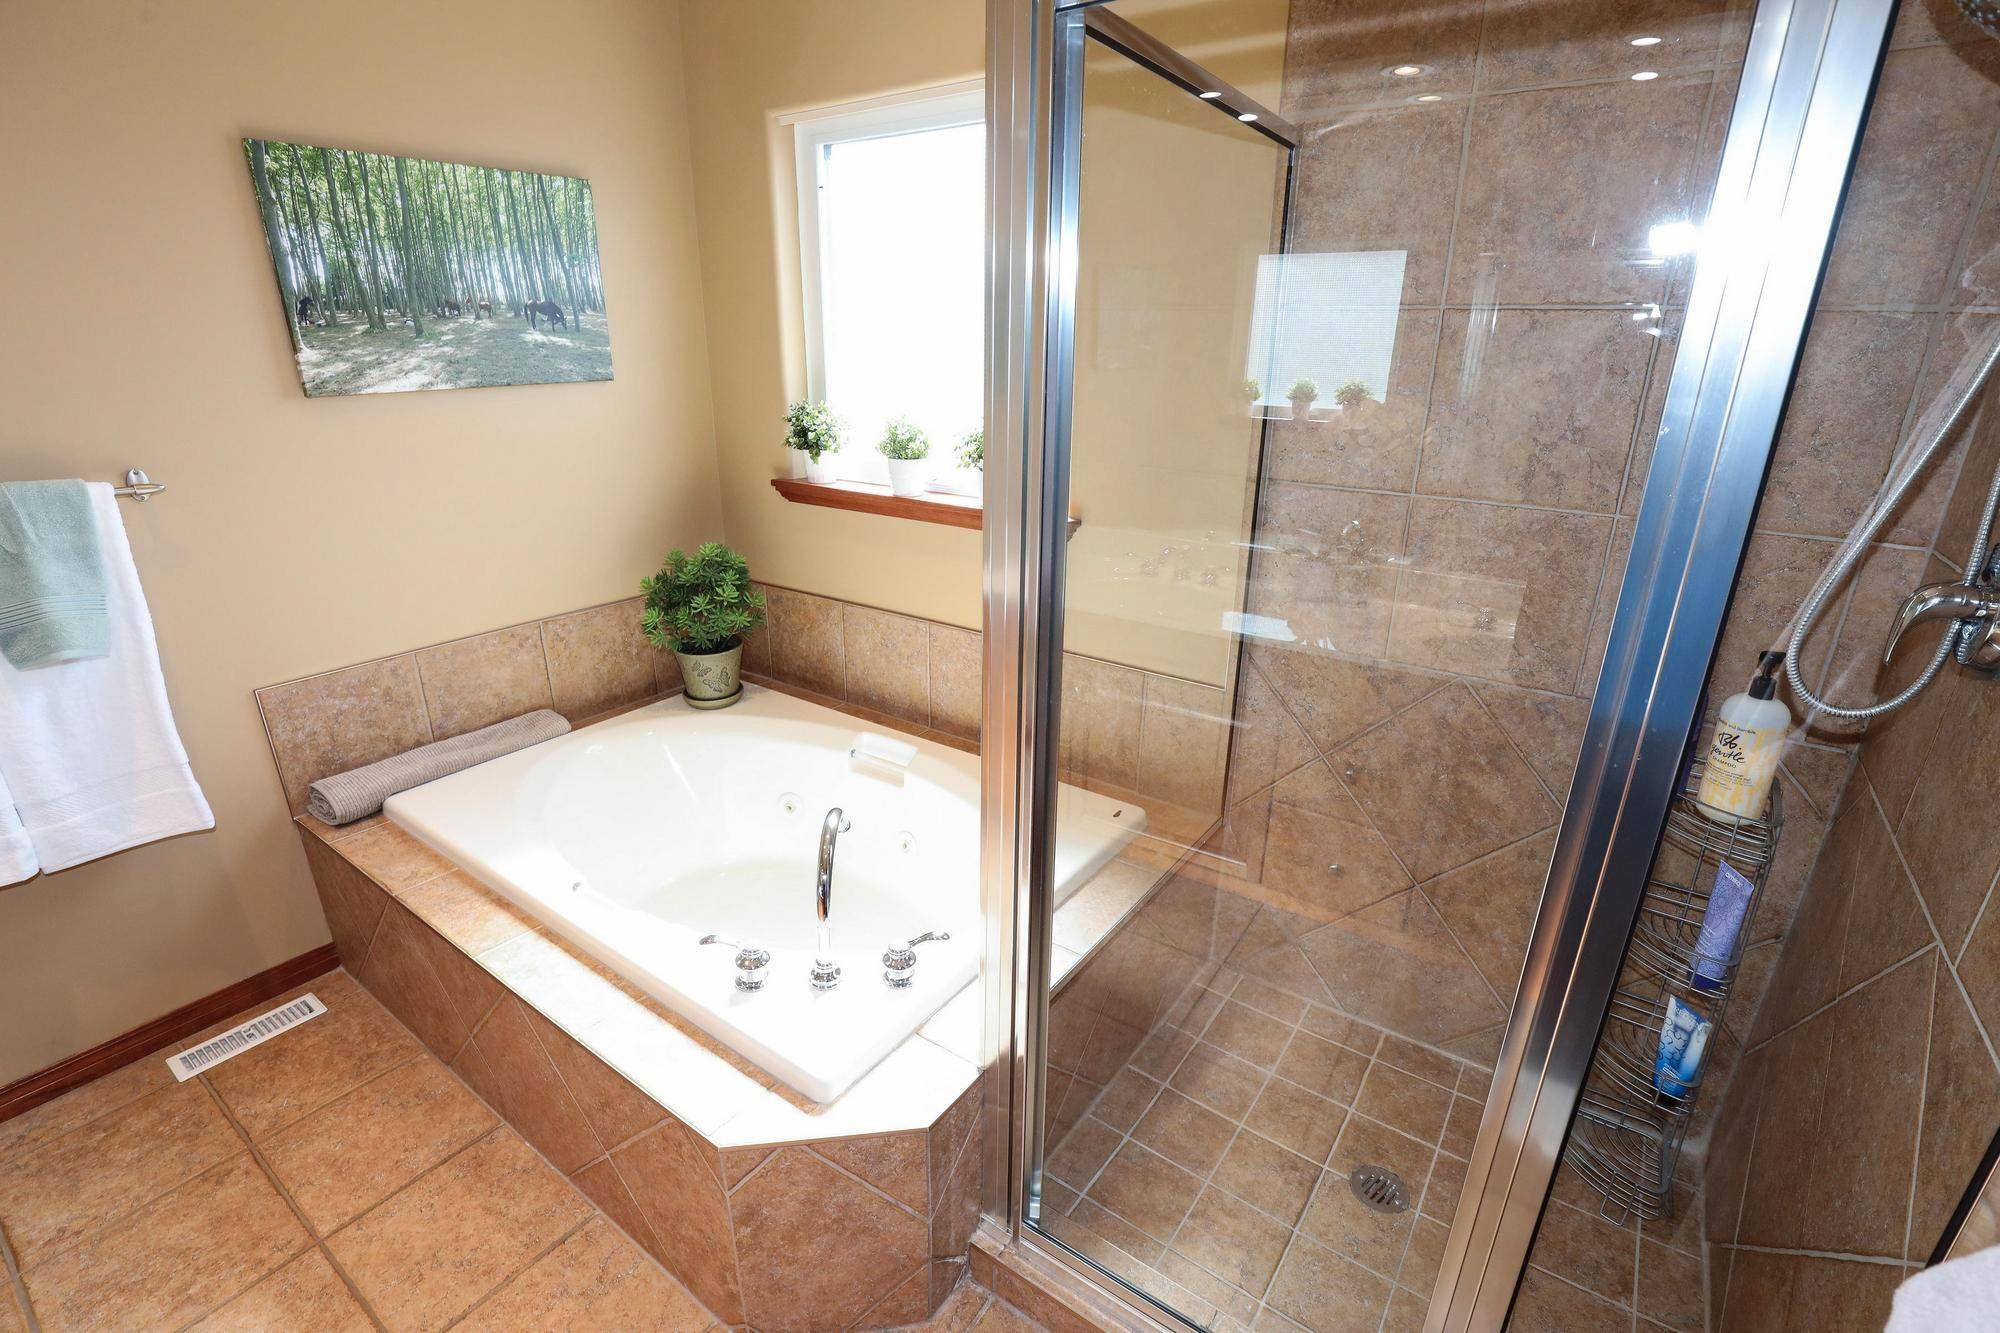 Photo 20: Photos: 7 Castle Ridge Drive in Winnipeg: Linden Ridge Single Family Detached for sale (1M)  : MLS®# 202107901